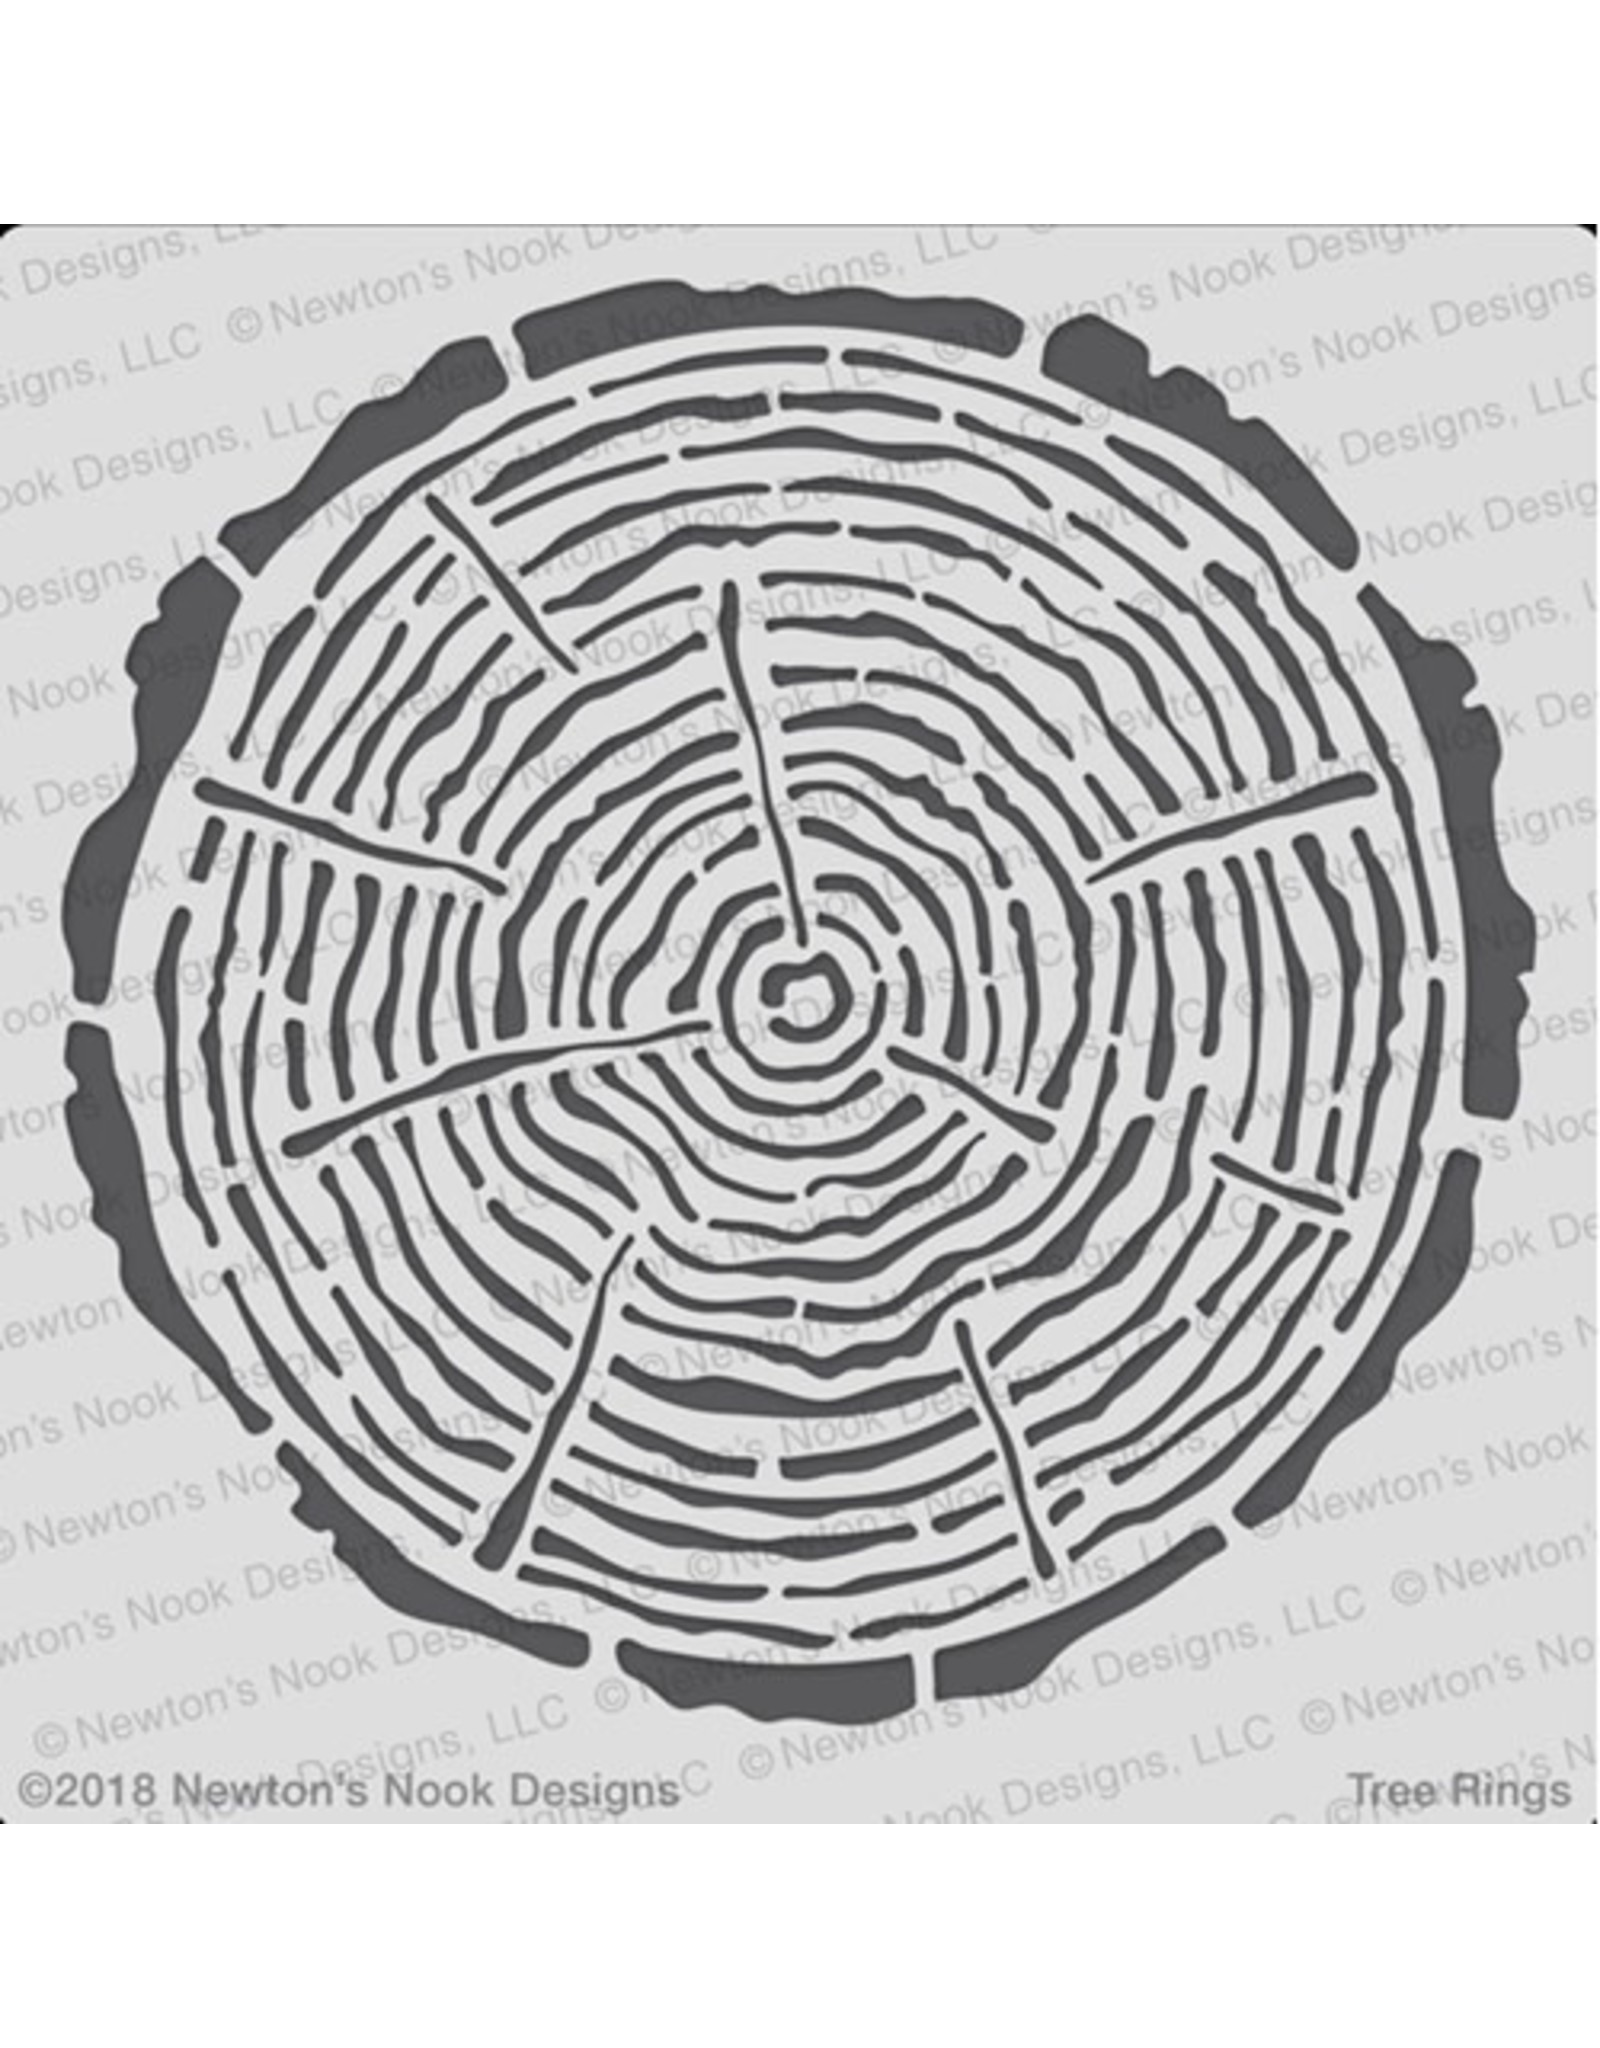 Newton's Nook Tree Rings - 6x6 Stencil